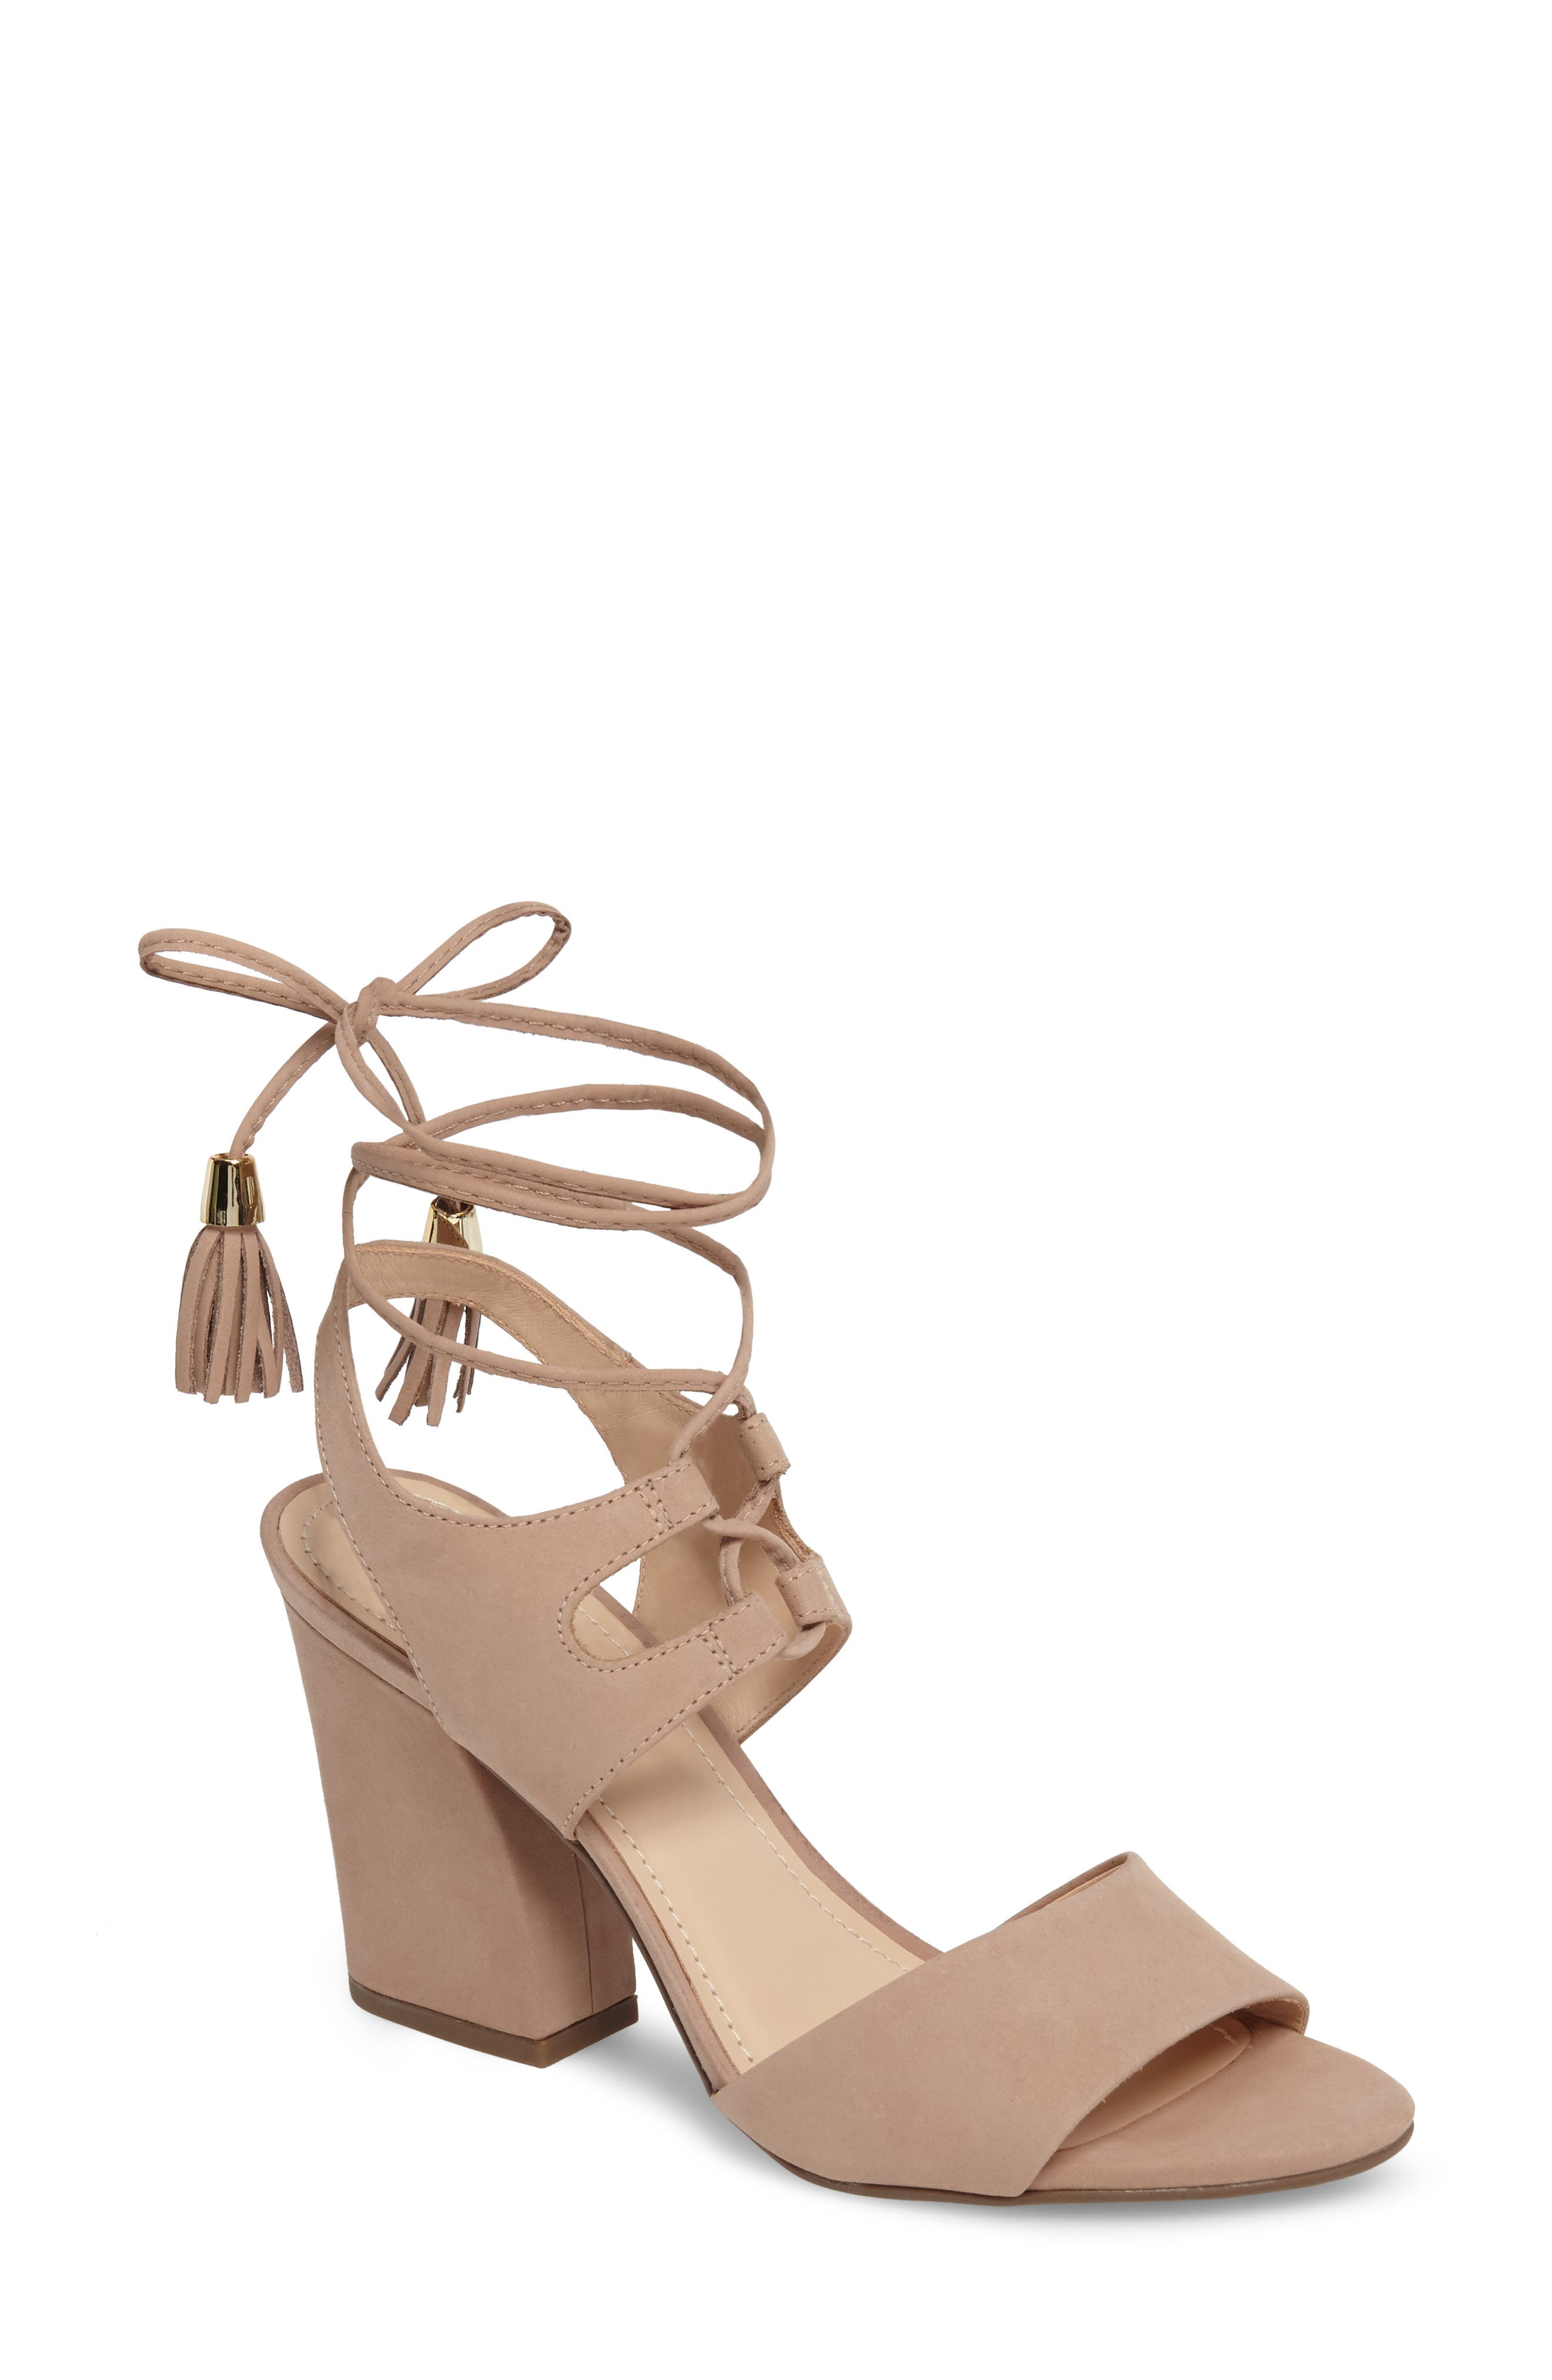 Main Image - Klub Nico Kaira Ankle Wrap Sandal (Women)